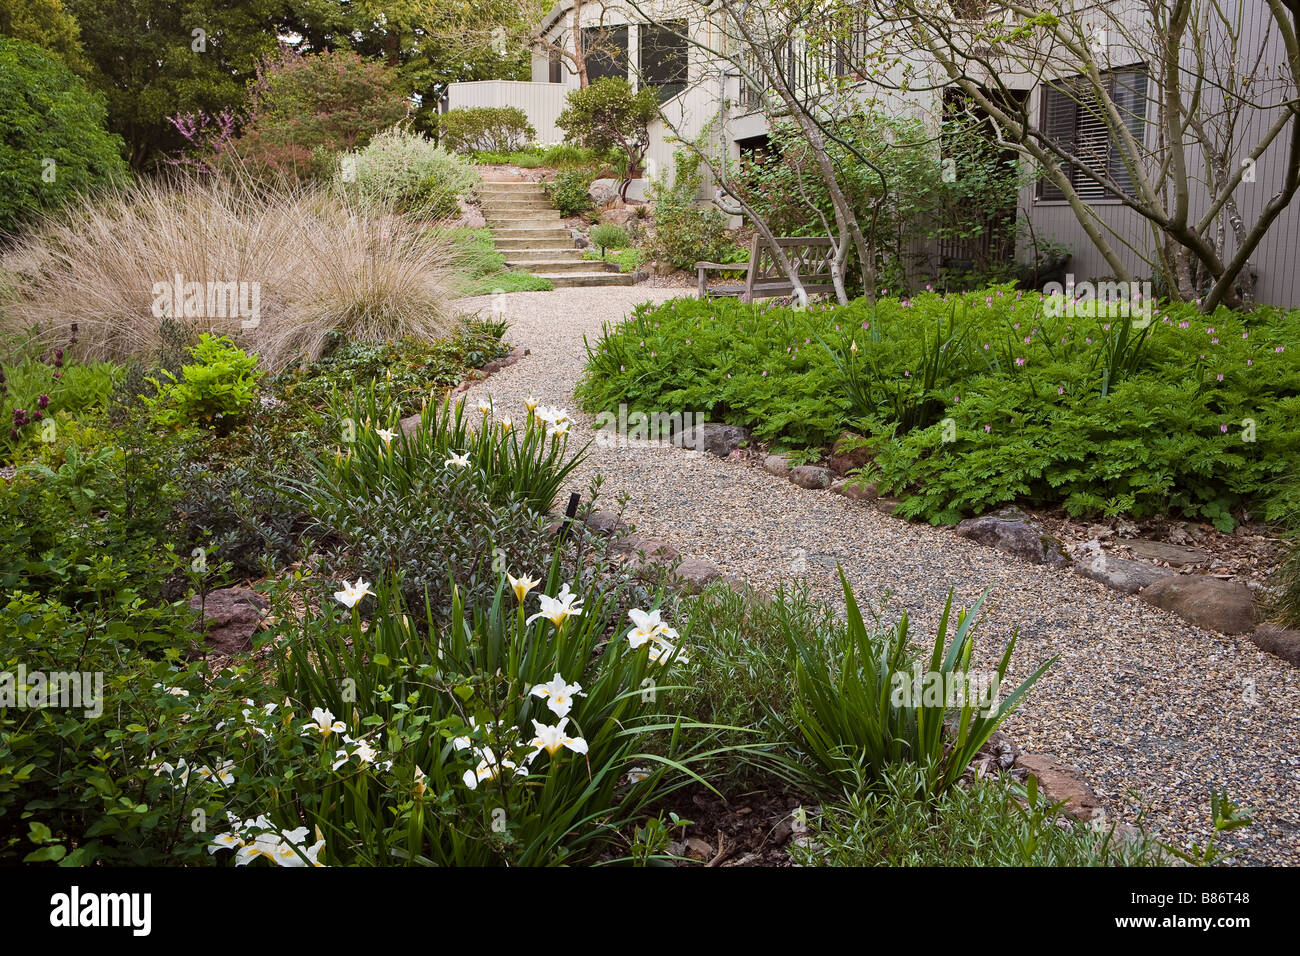 Gravel Path Leading To Patio In Drought Tolerant California Native Plant  Garden   Stock Image